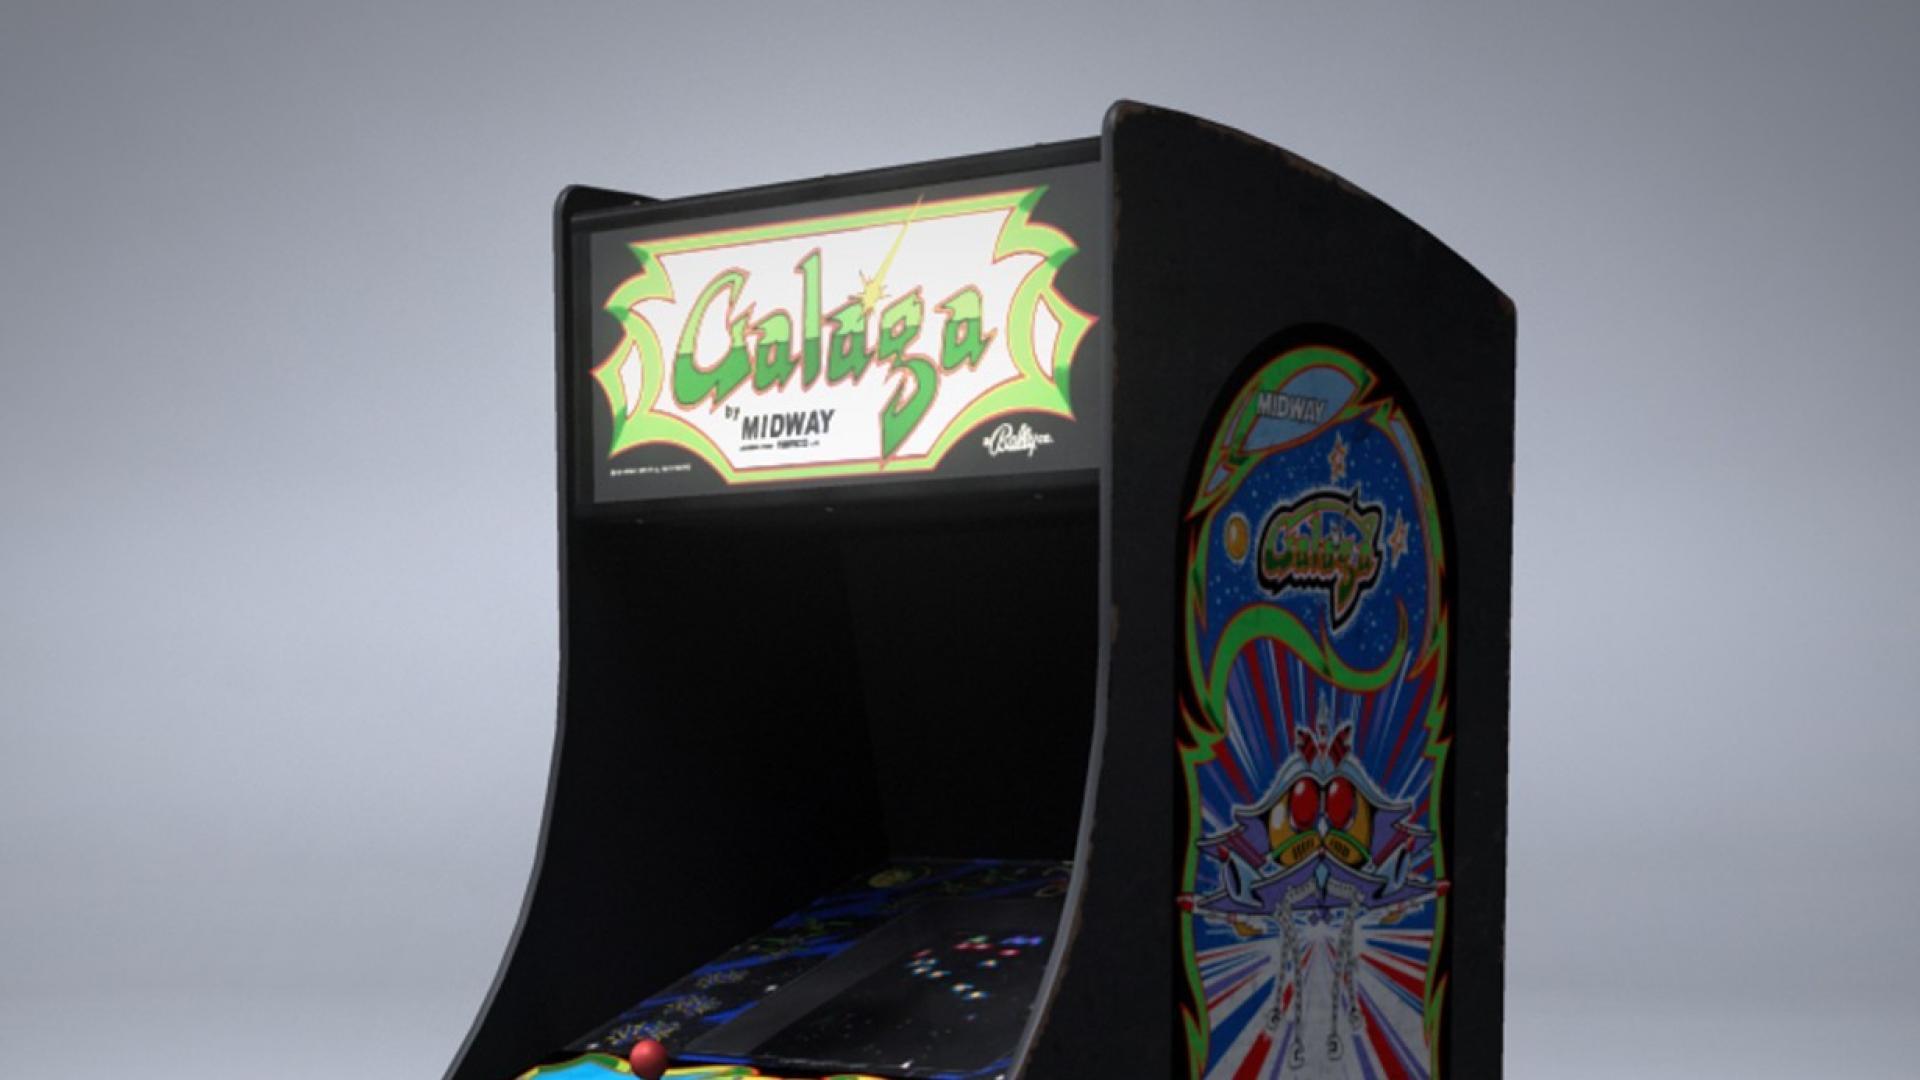 Arcade iphone galaga gaming retro games wallpaper 26516 1920x1080